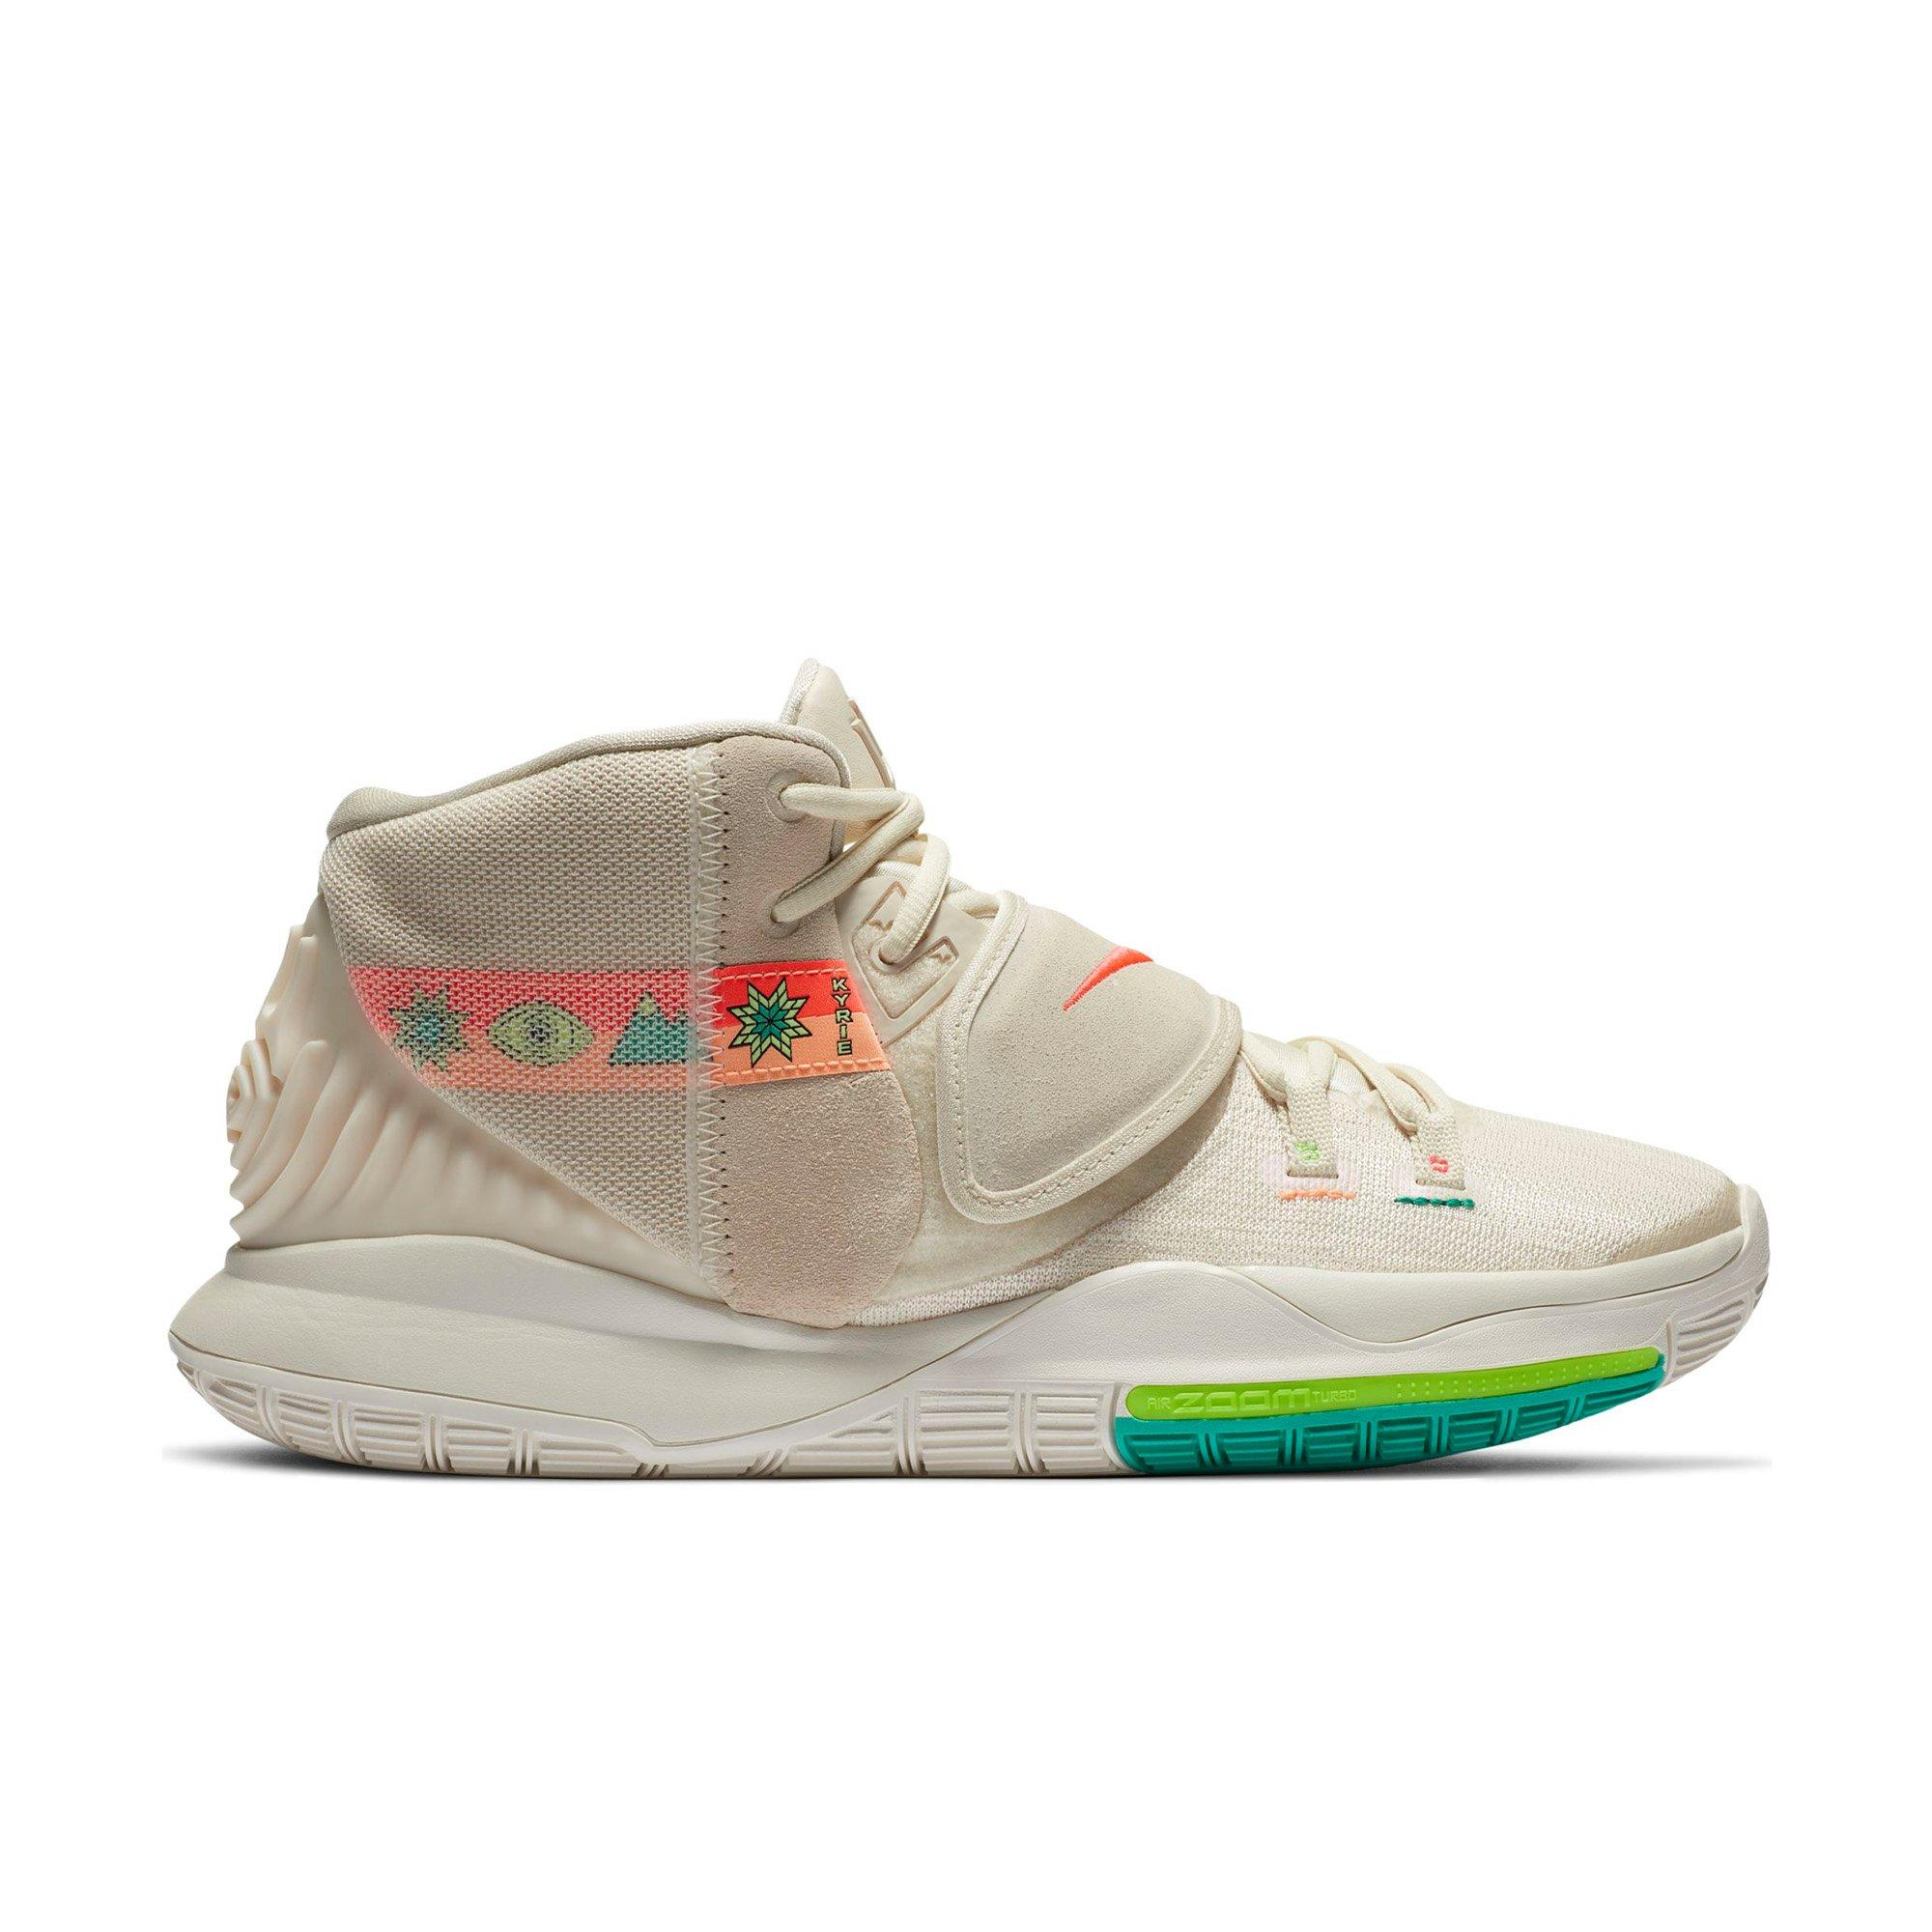 Nike Kyrie 6 N7 Men's Basketball Shoe